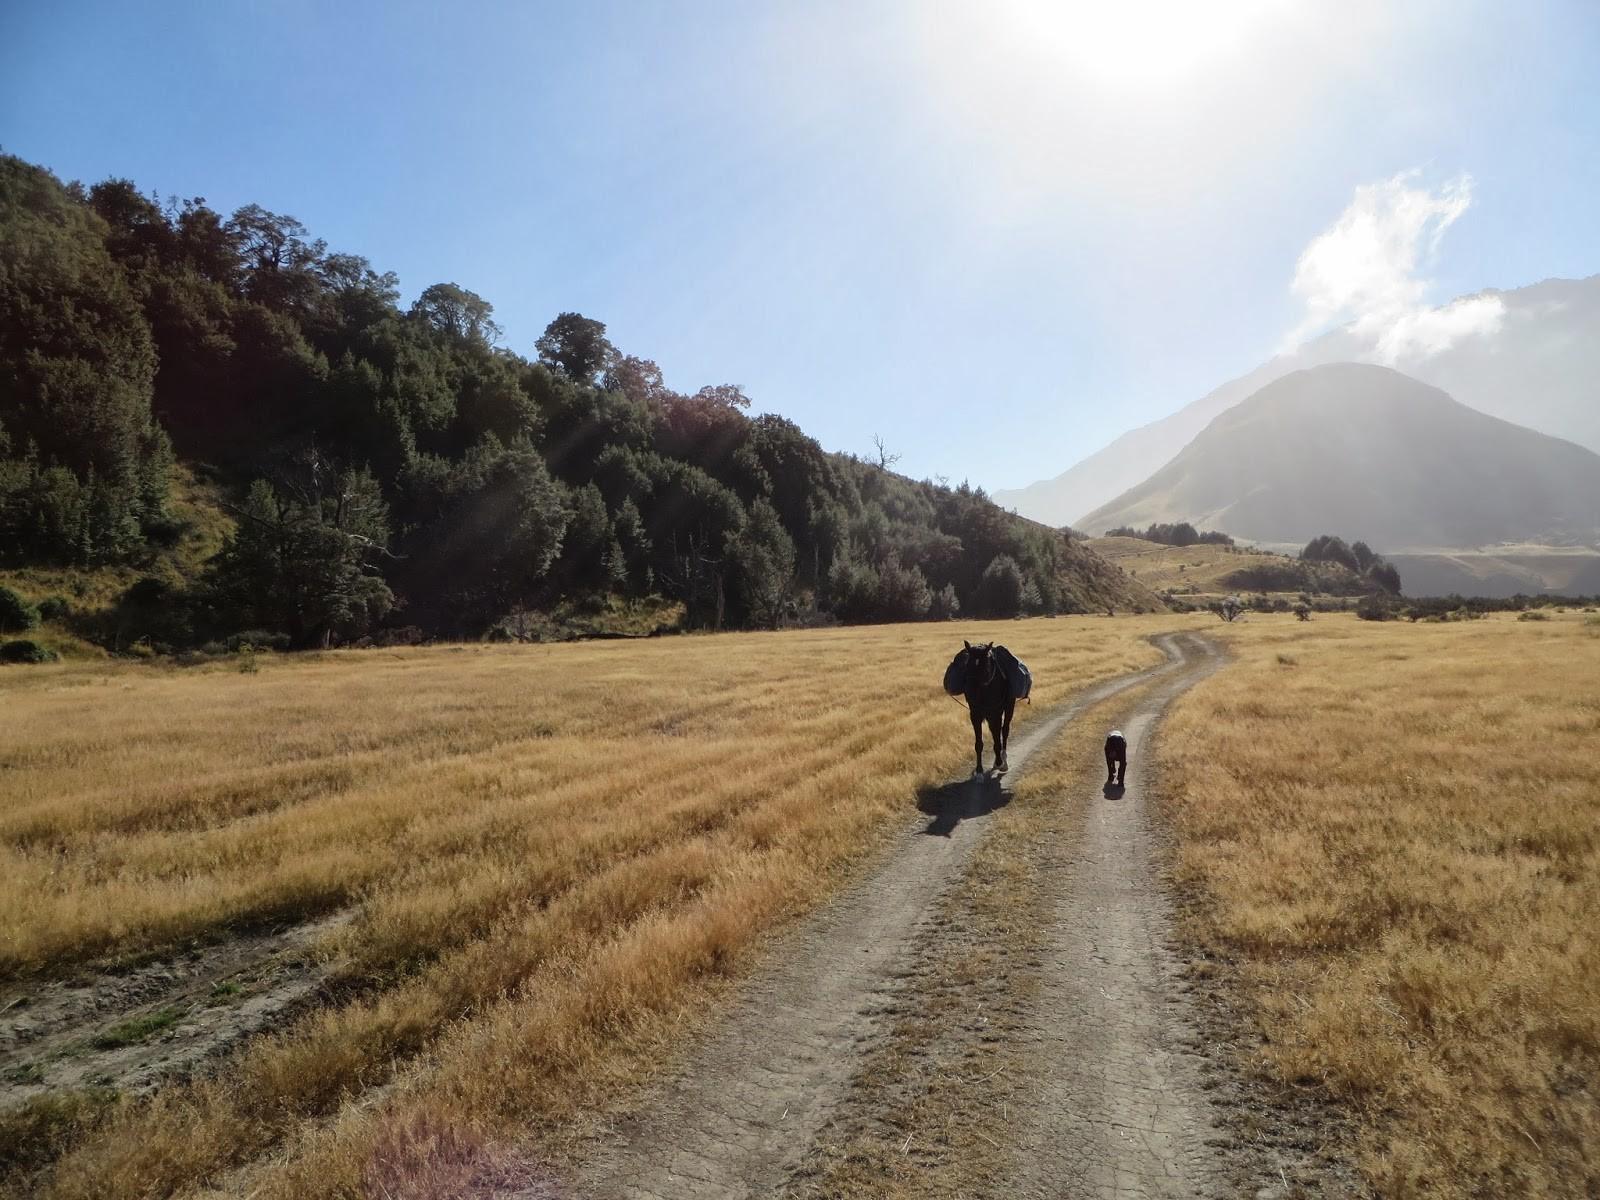 Canterbury and Marlborough - Amazing landscapes and horse trek